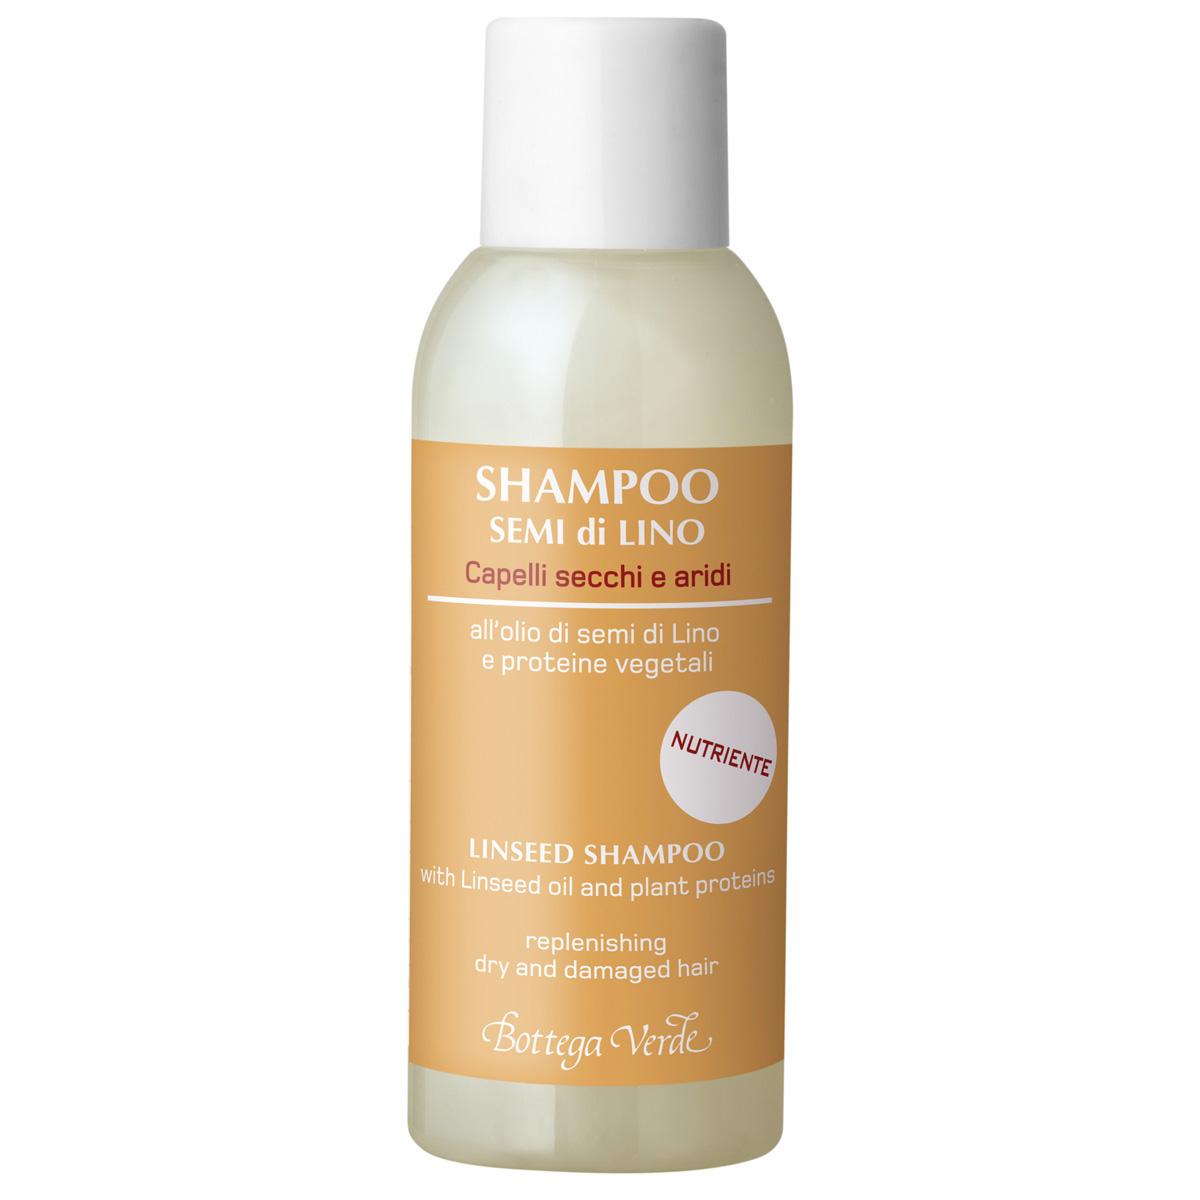 MINISIZE - HAIR - LINSEED SHAMPOO